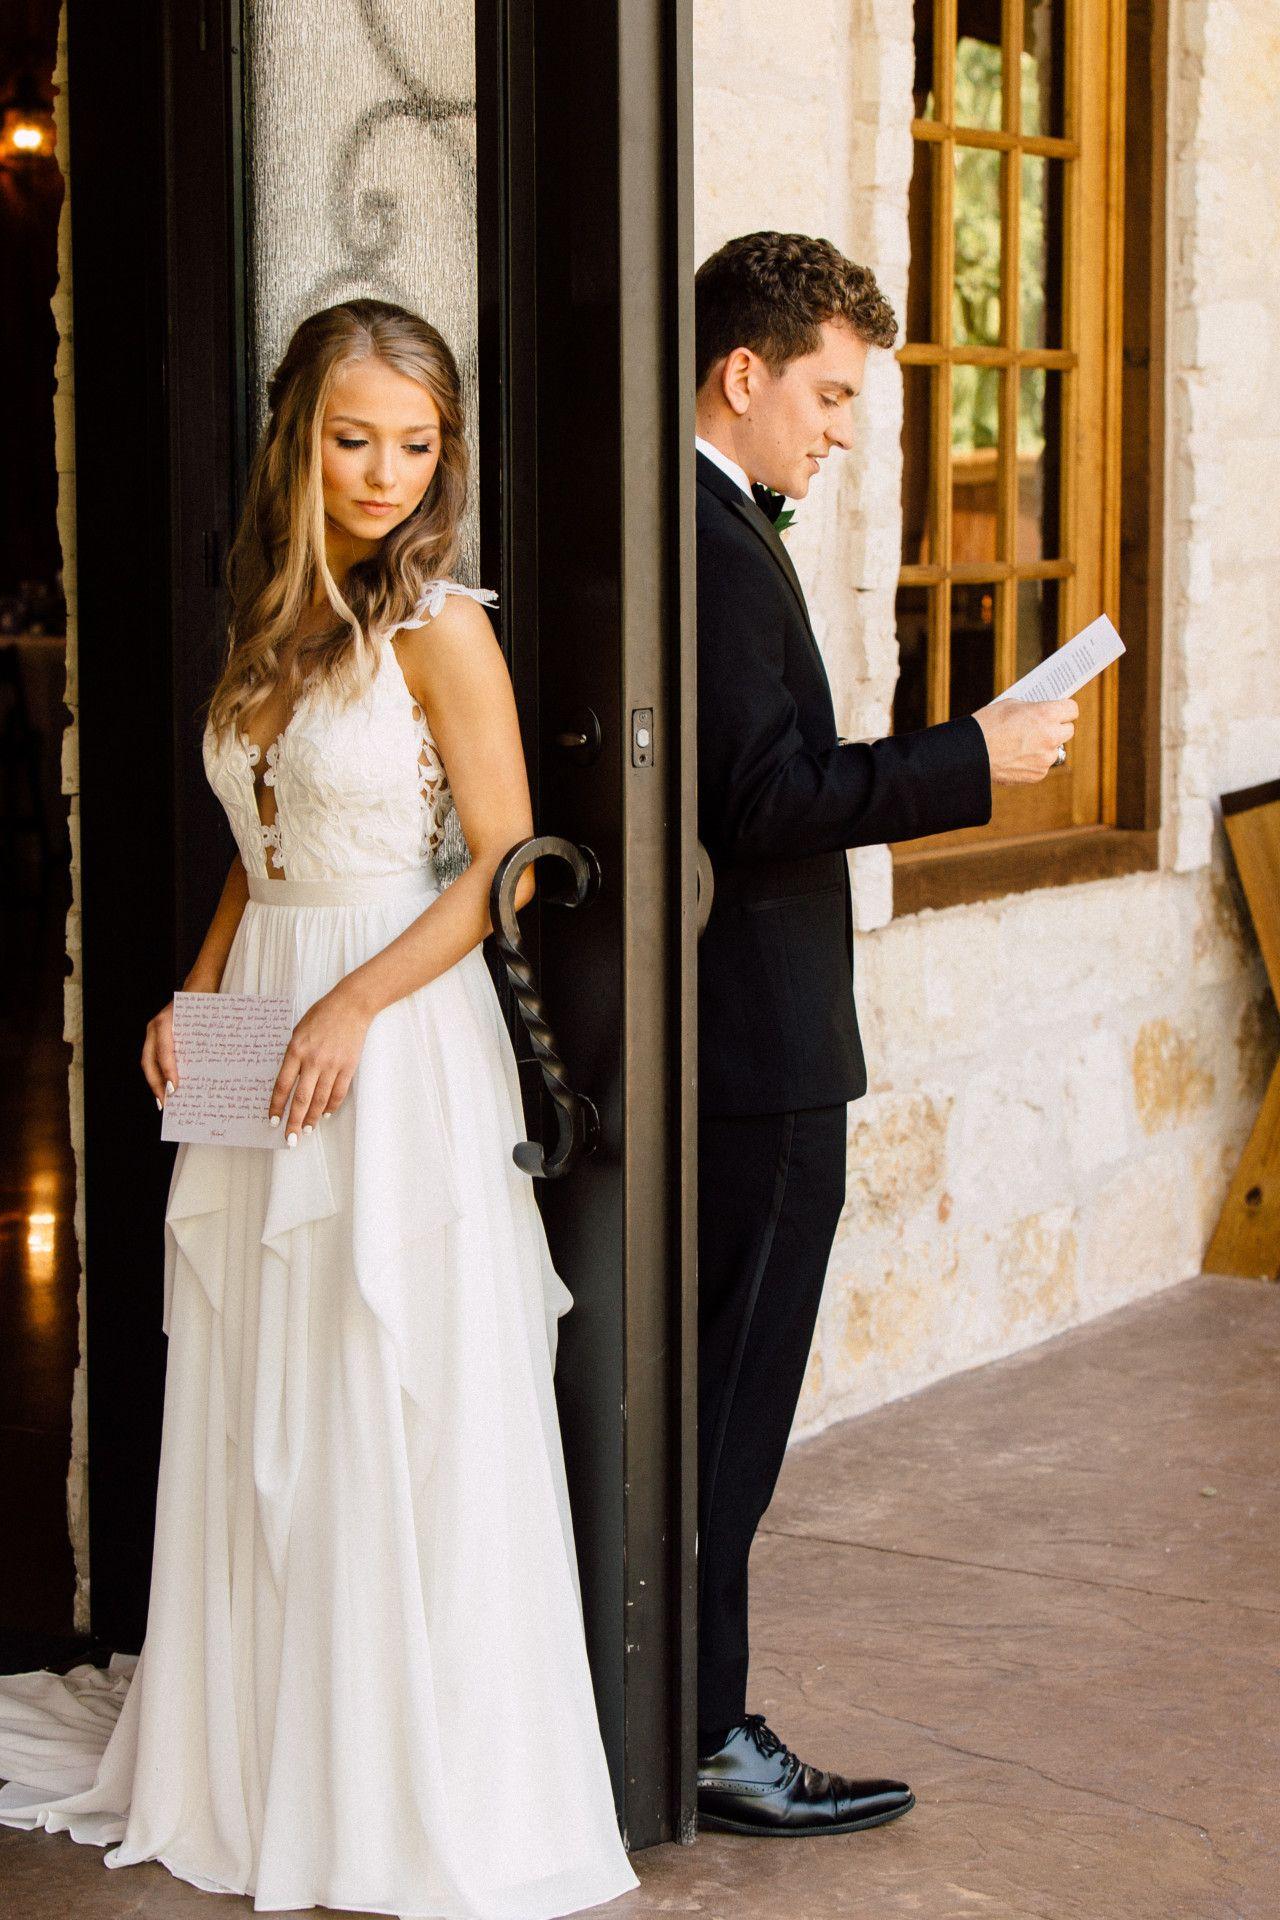 Wedding Venue Norman Oklahoma Boho Wedding Gown Bohemian Boho Wedding Dress Bohemian Bohemian Style Wedding